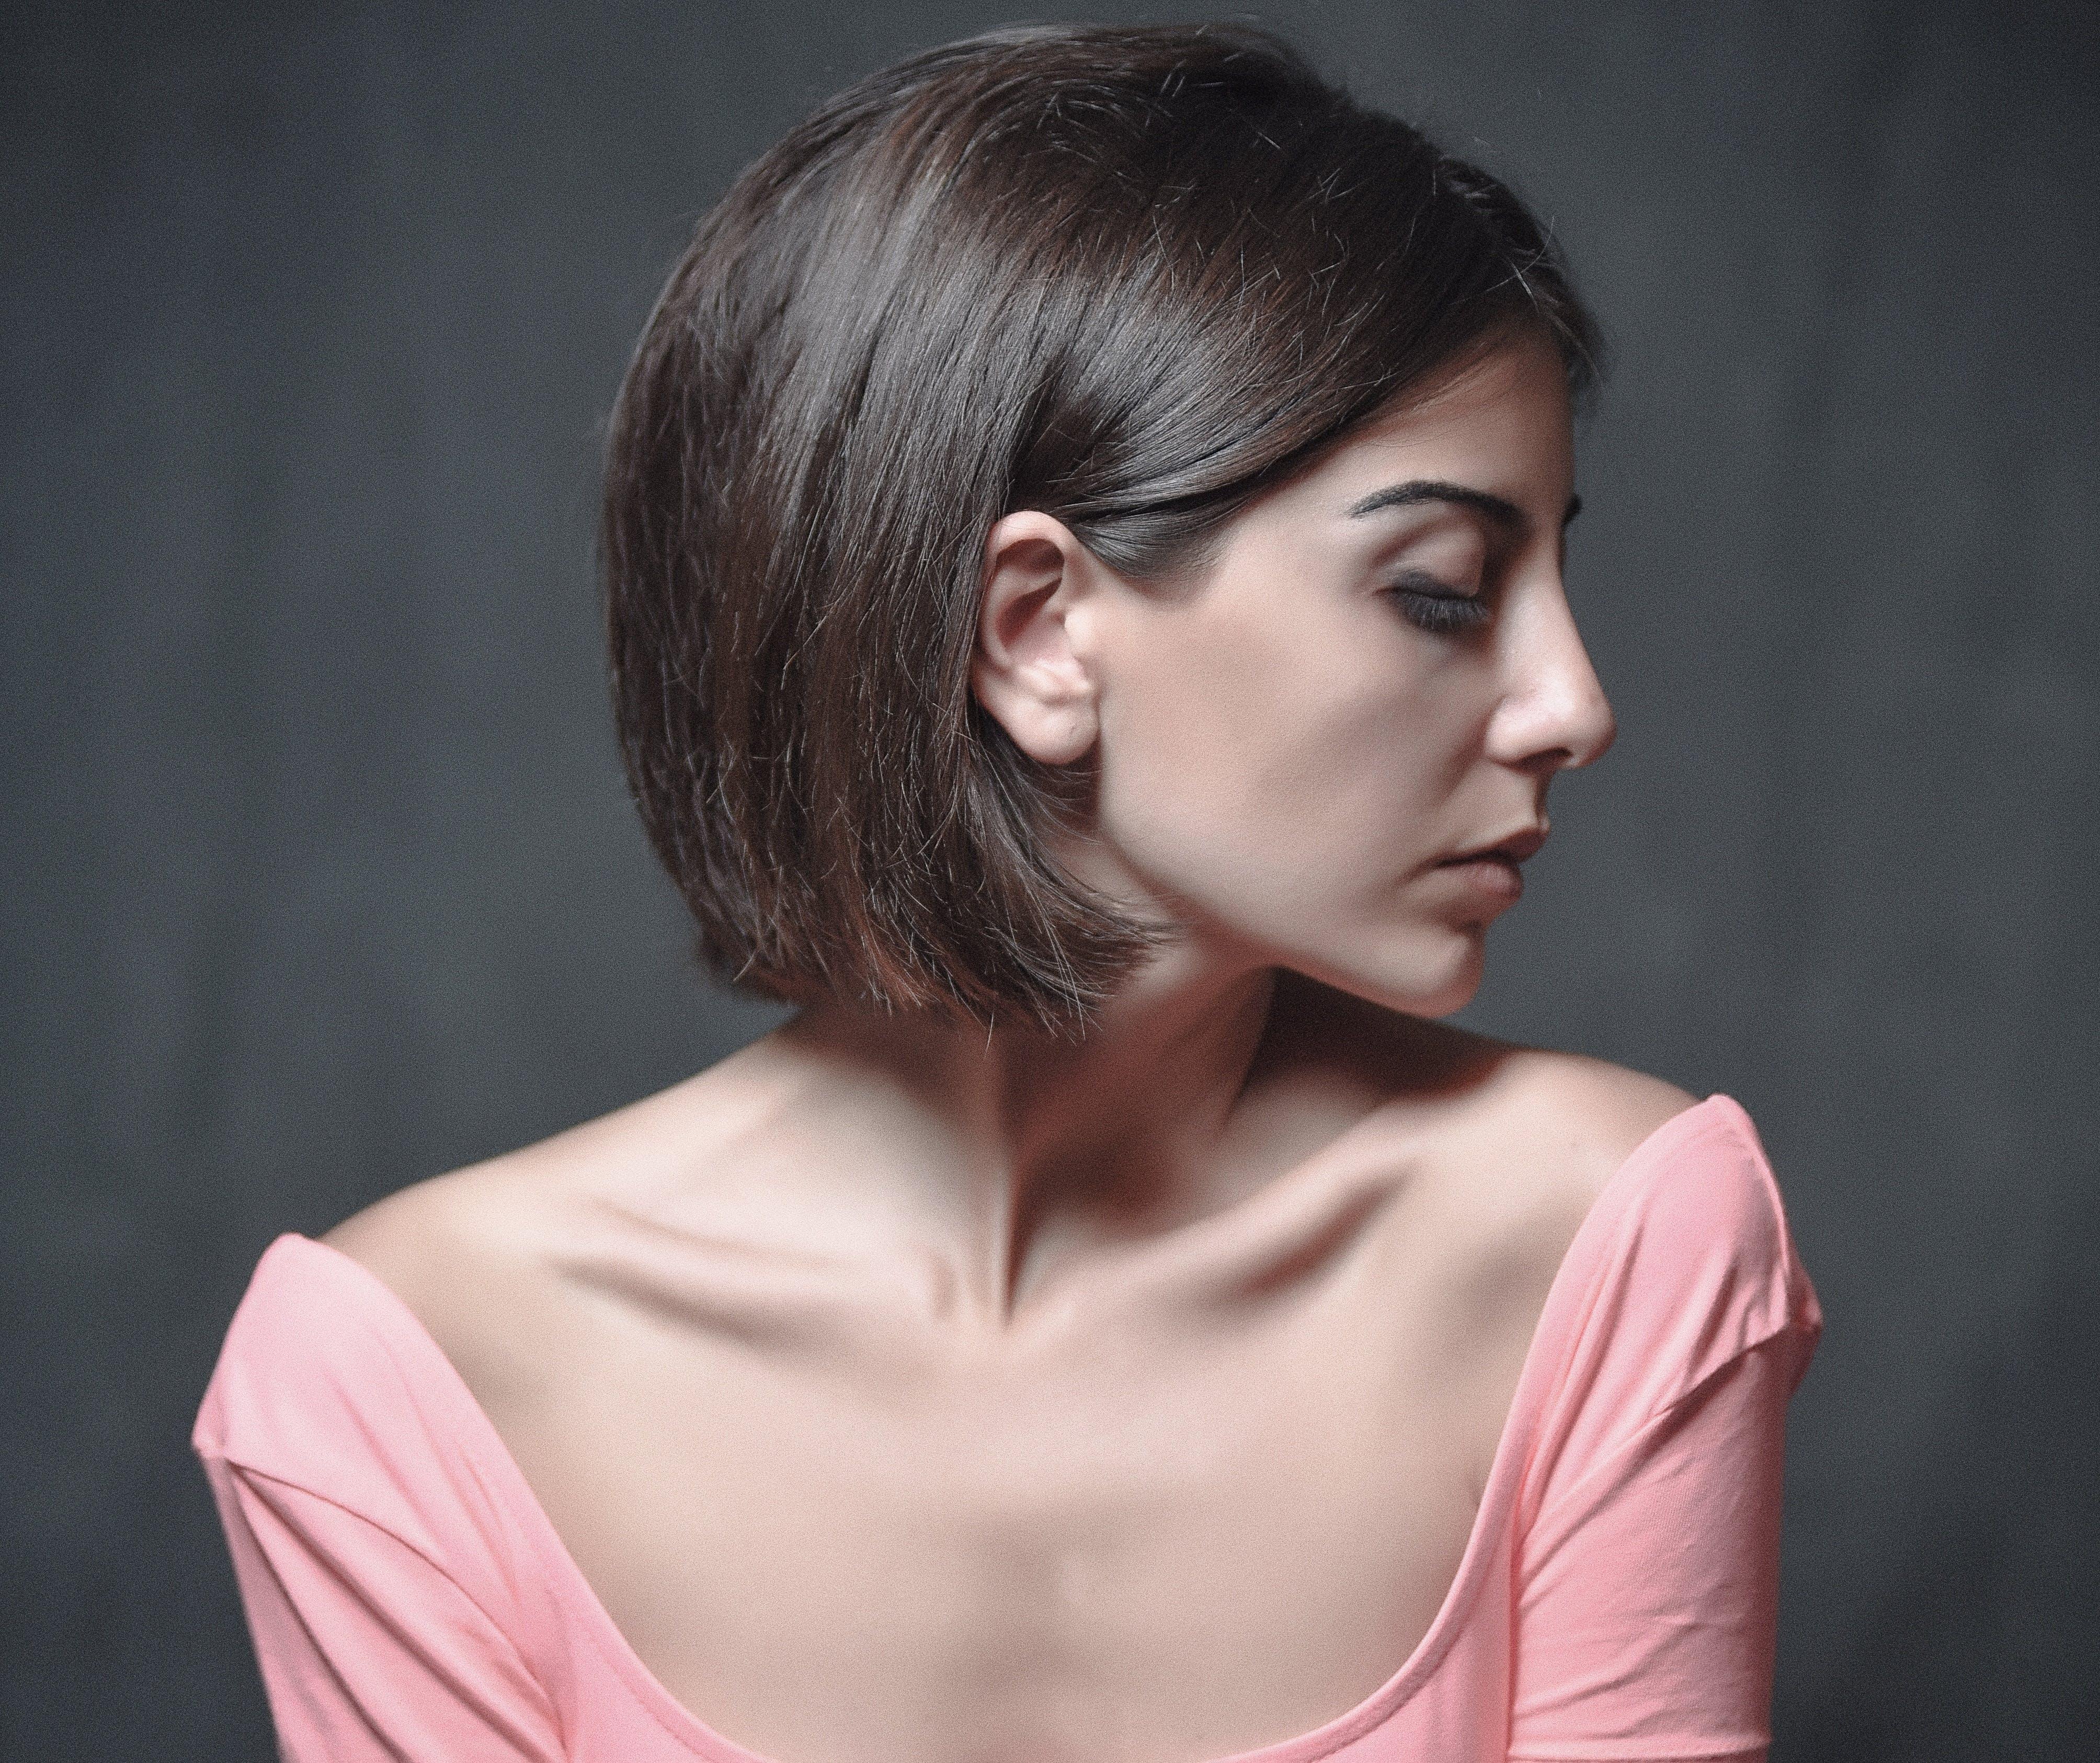 Woman Wearing Pink Scoop Neck Shirt